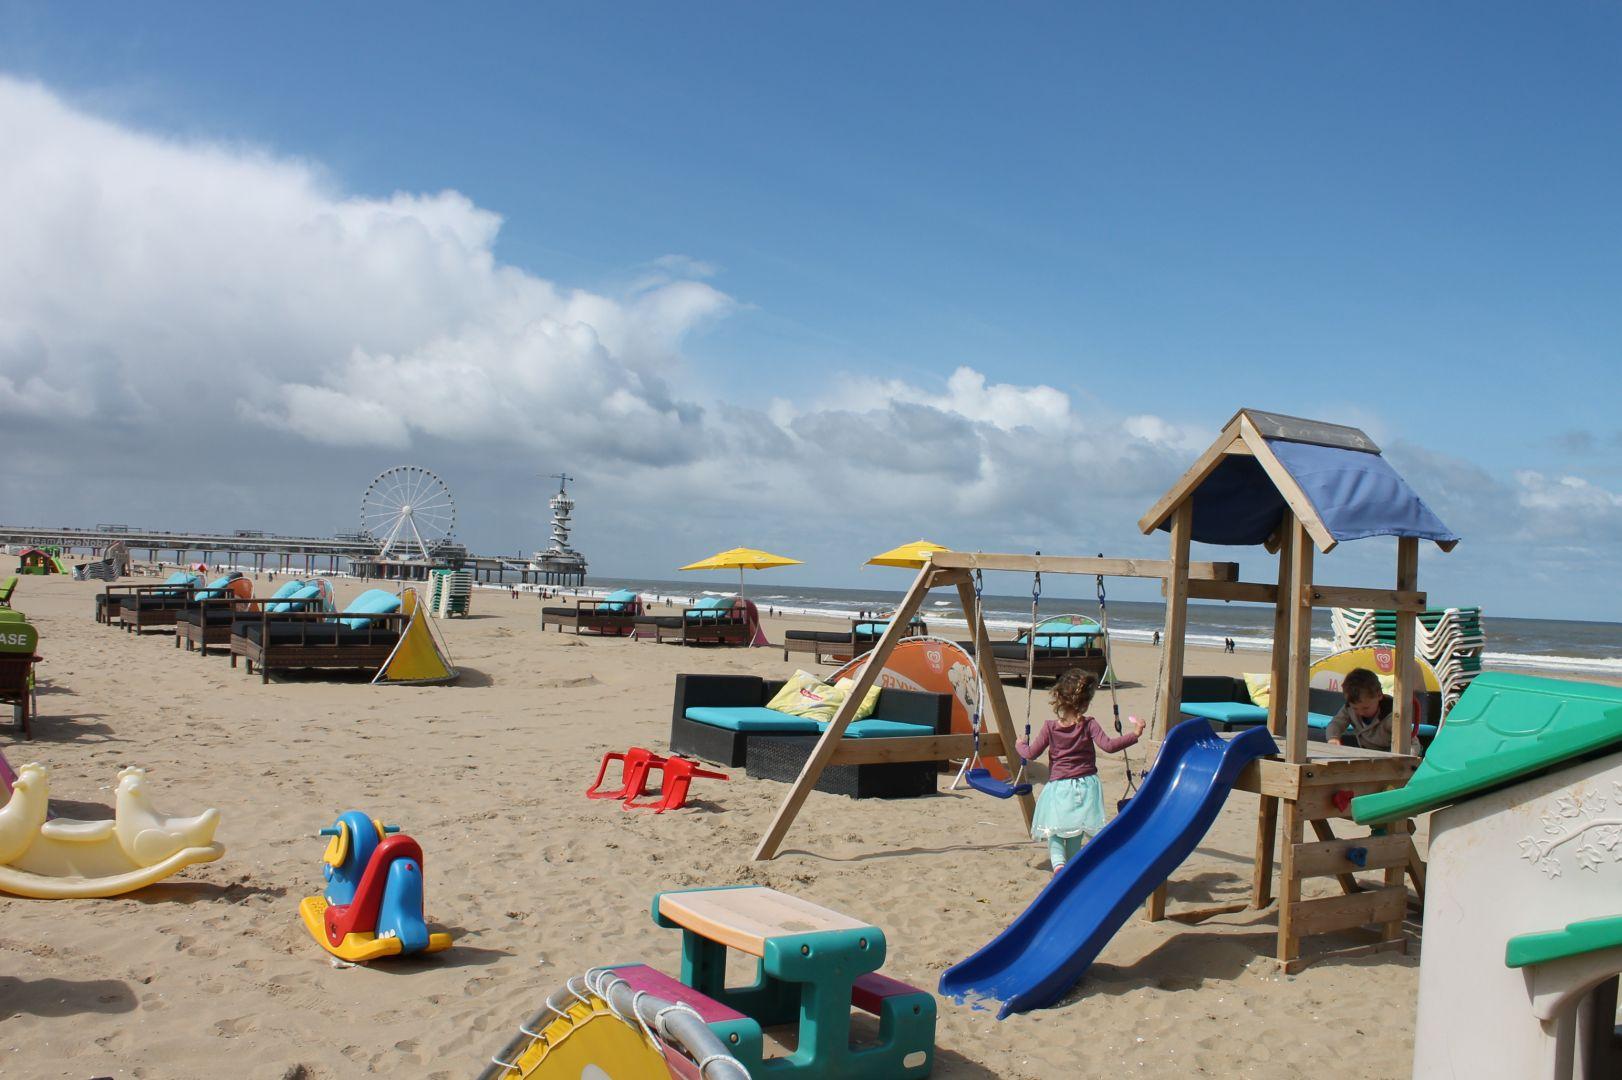 kindvriendelijke strandtent Scheveningen